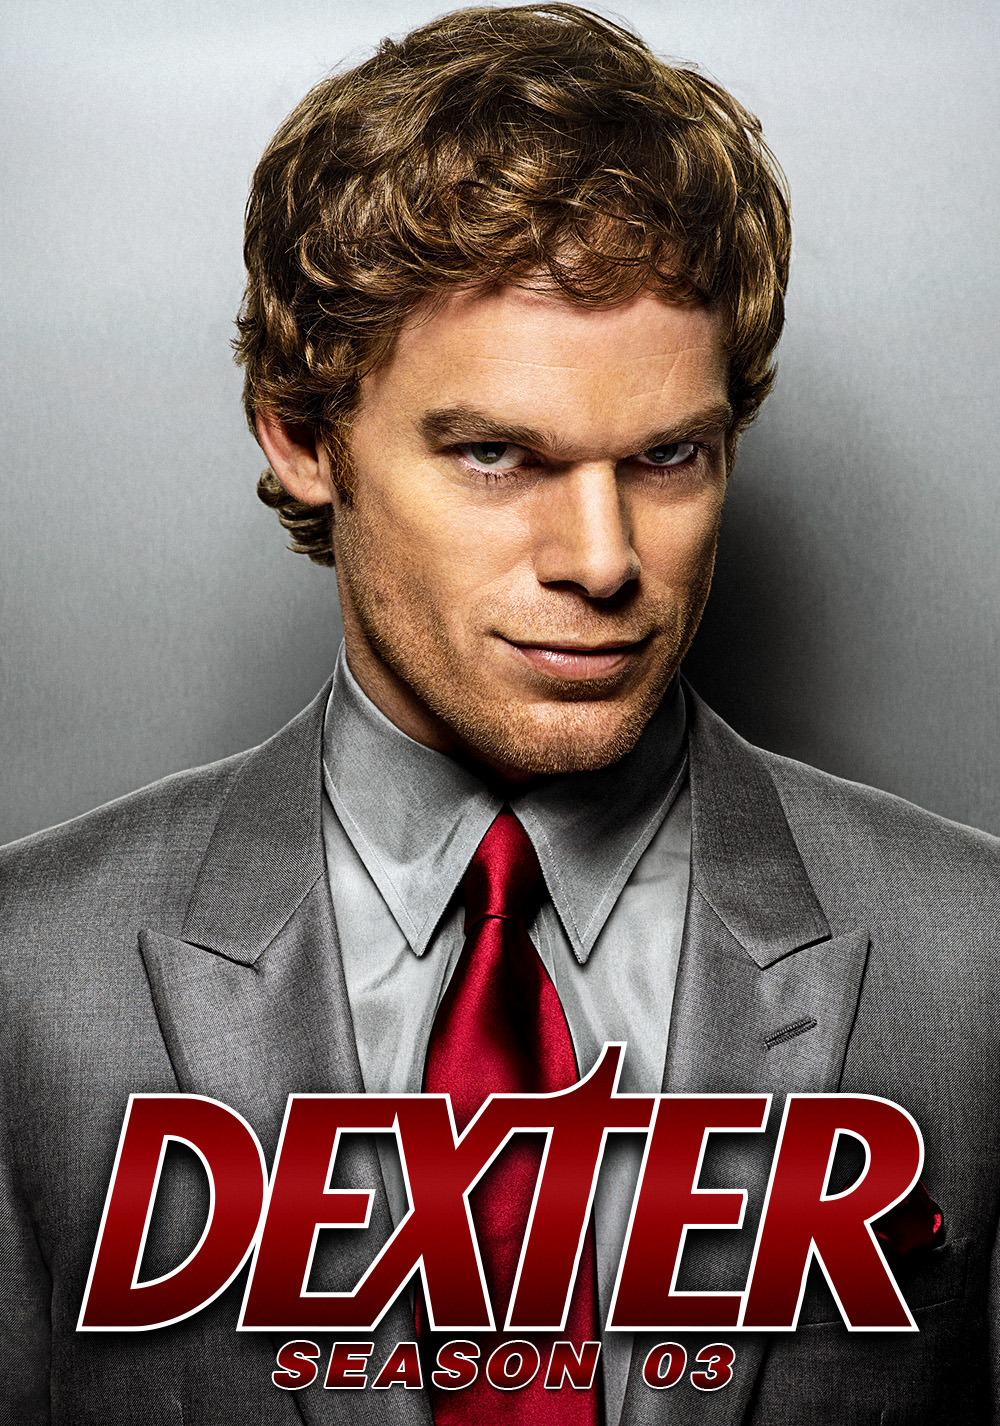 Dexter|Colección 1-8|Latino-Ingles|1080p|96/96|x265 10bit|+ Soundtracks  Season03-poster